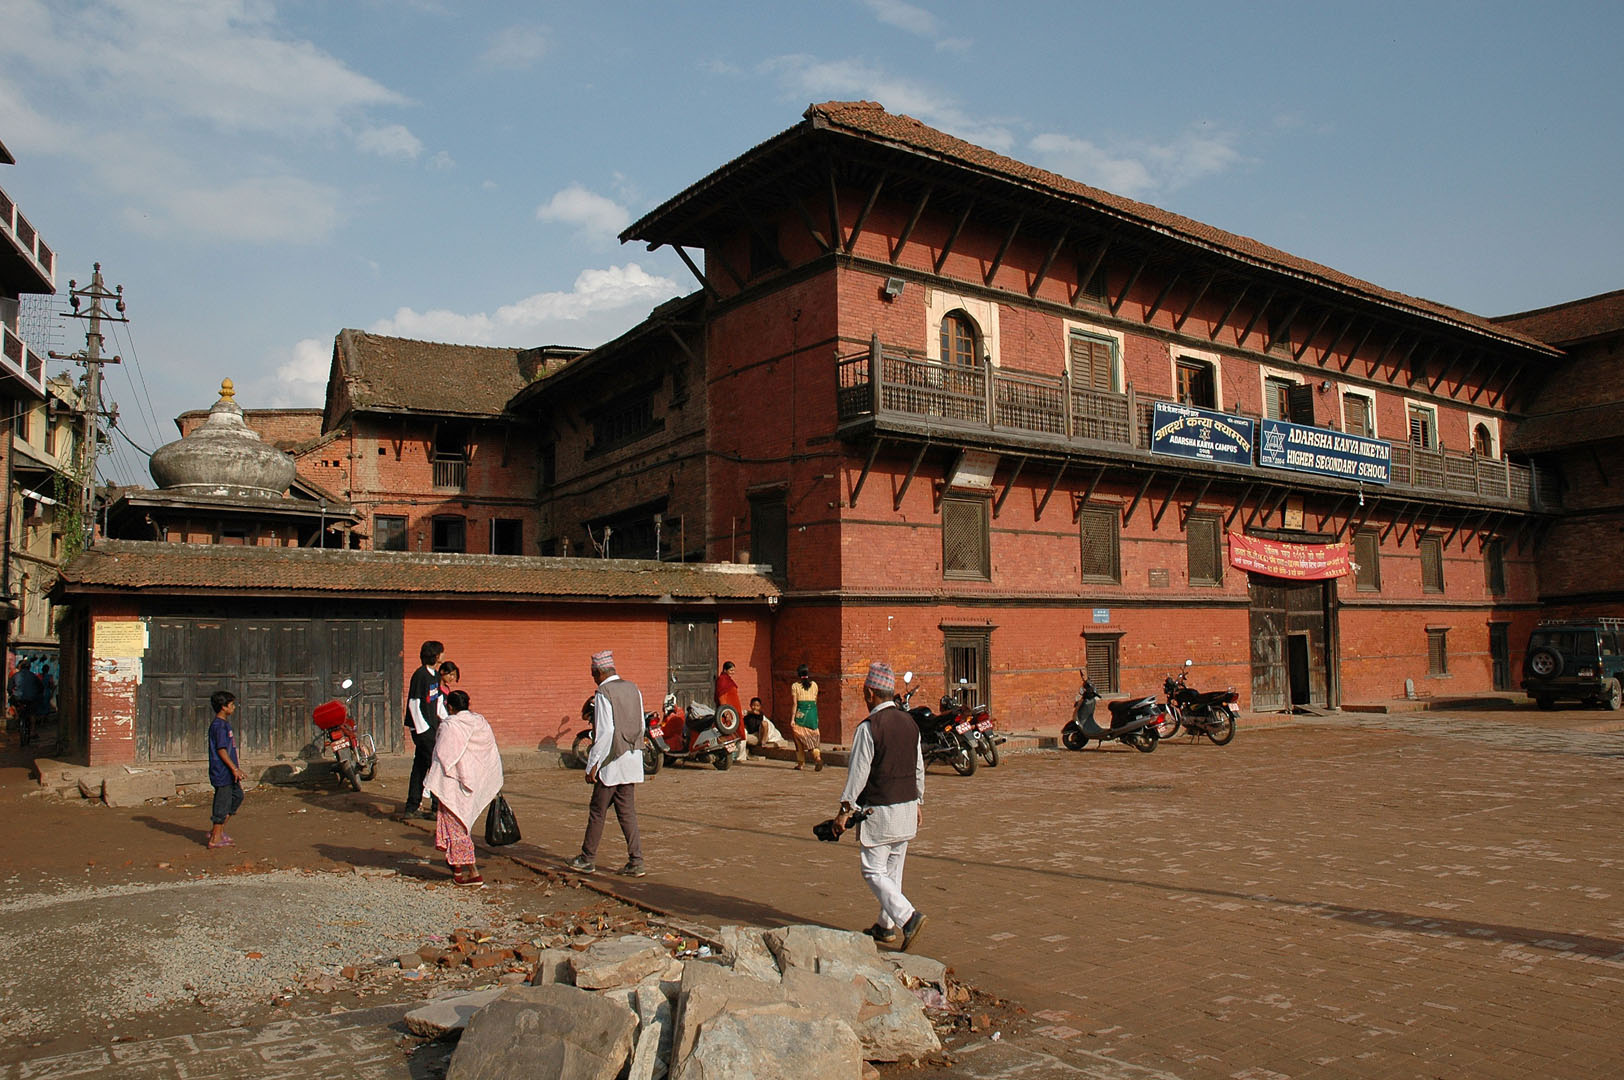 bahadur shah front facade.jpg